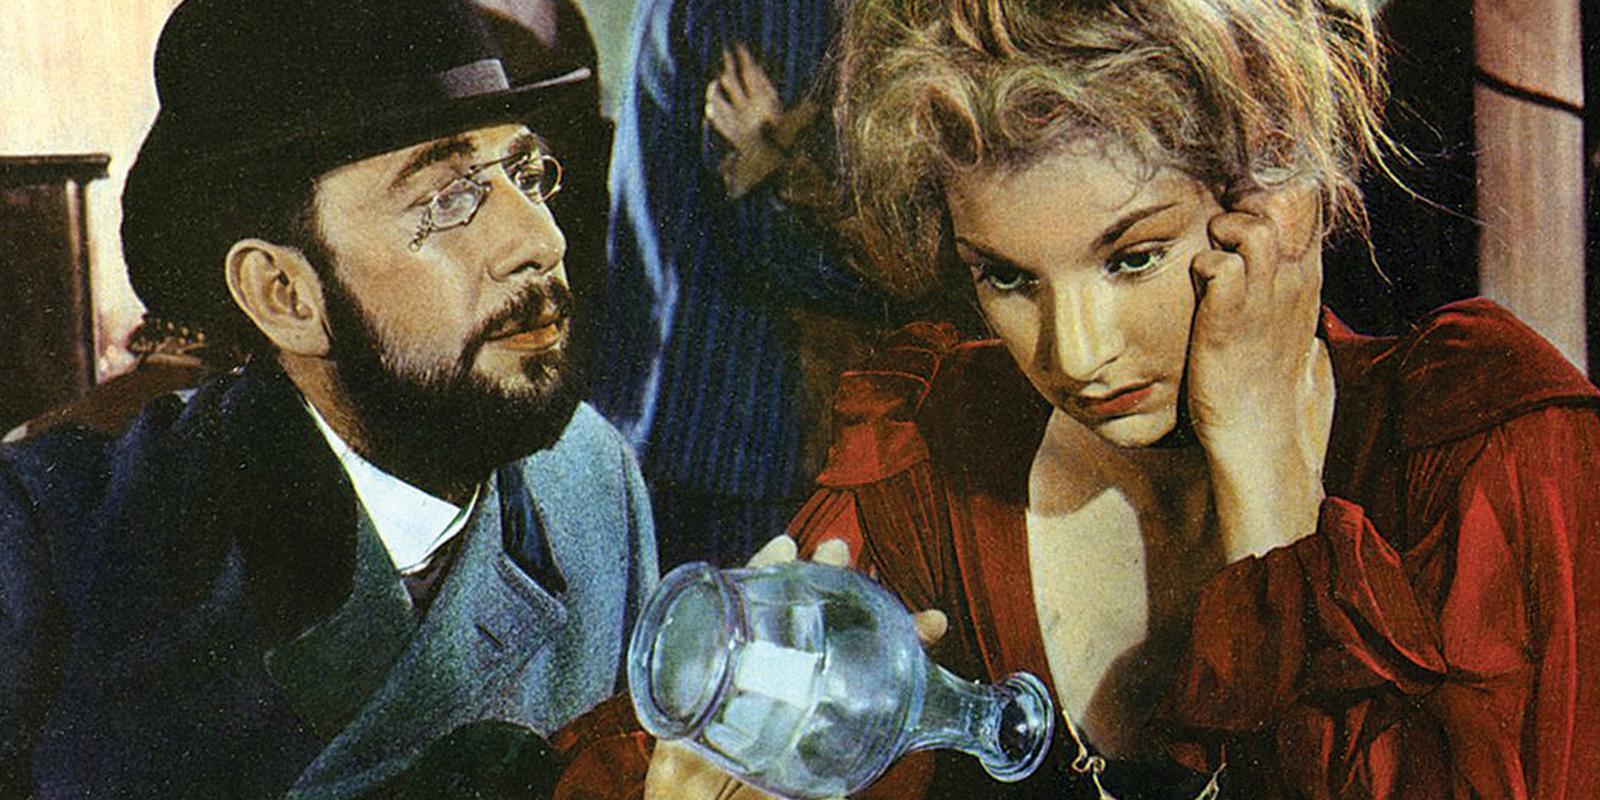 Moulin Rouge (John Huston, 1952)